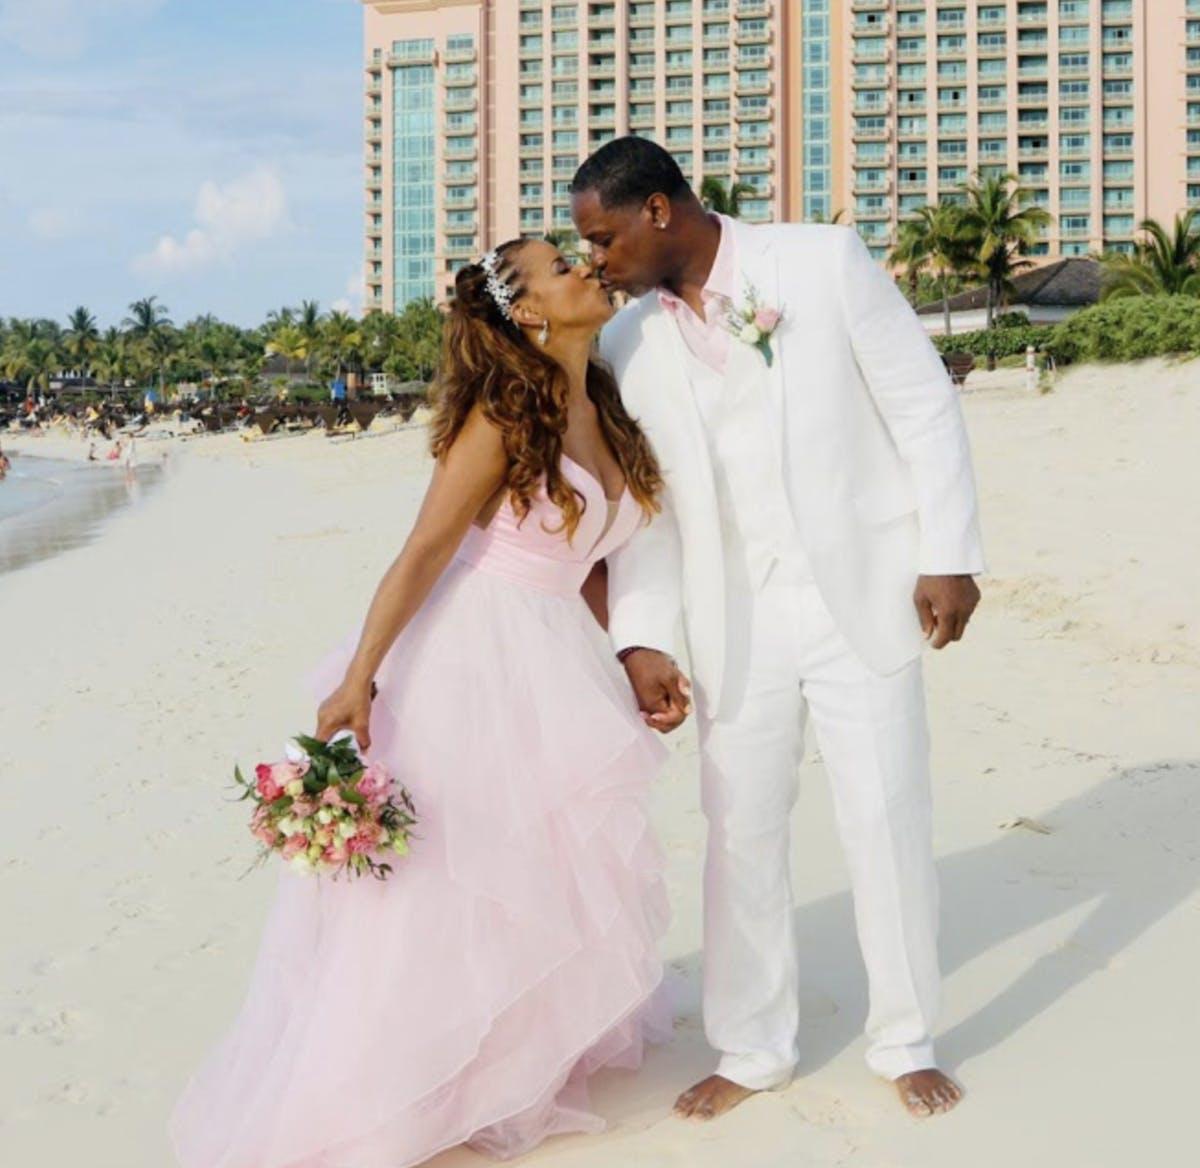 Nassau Bahamas Beach wedding